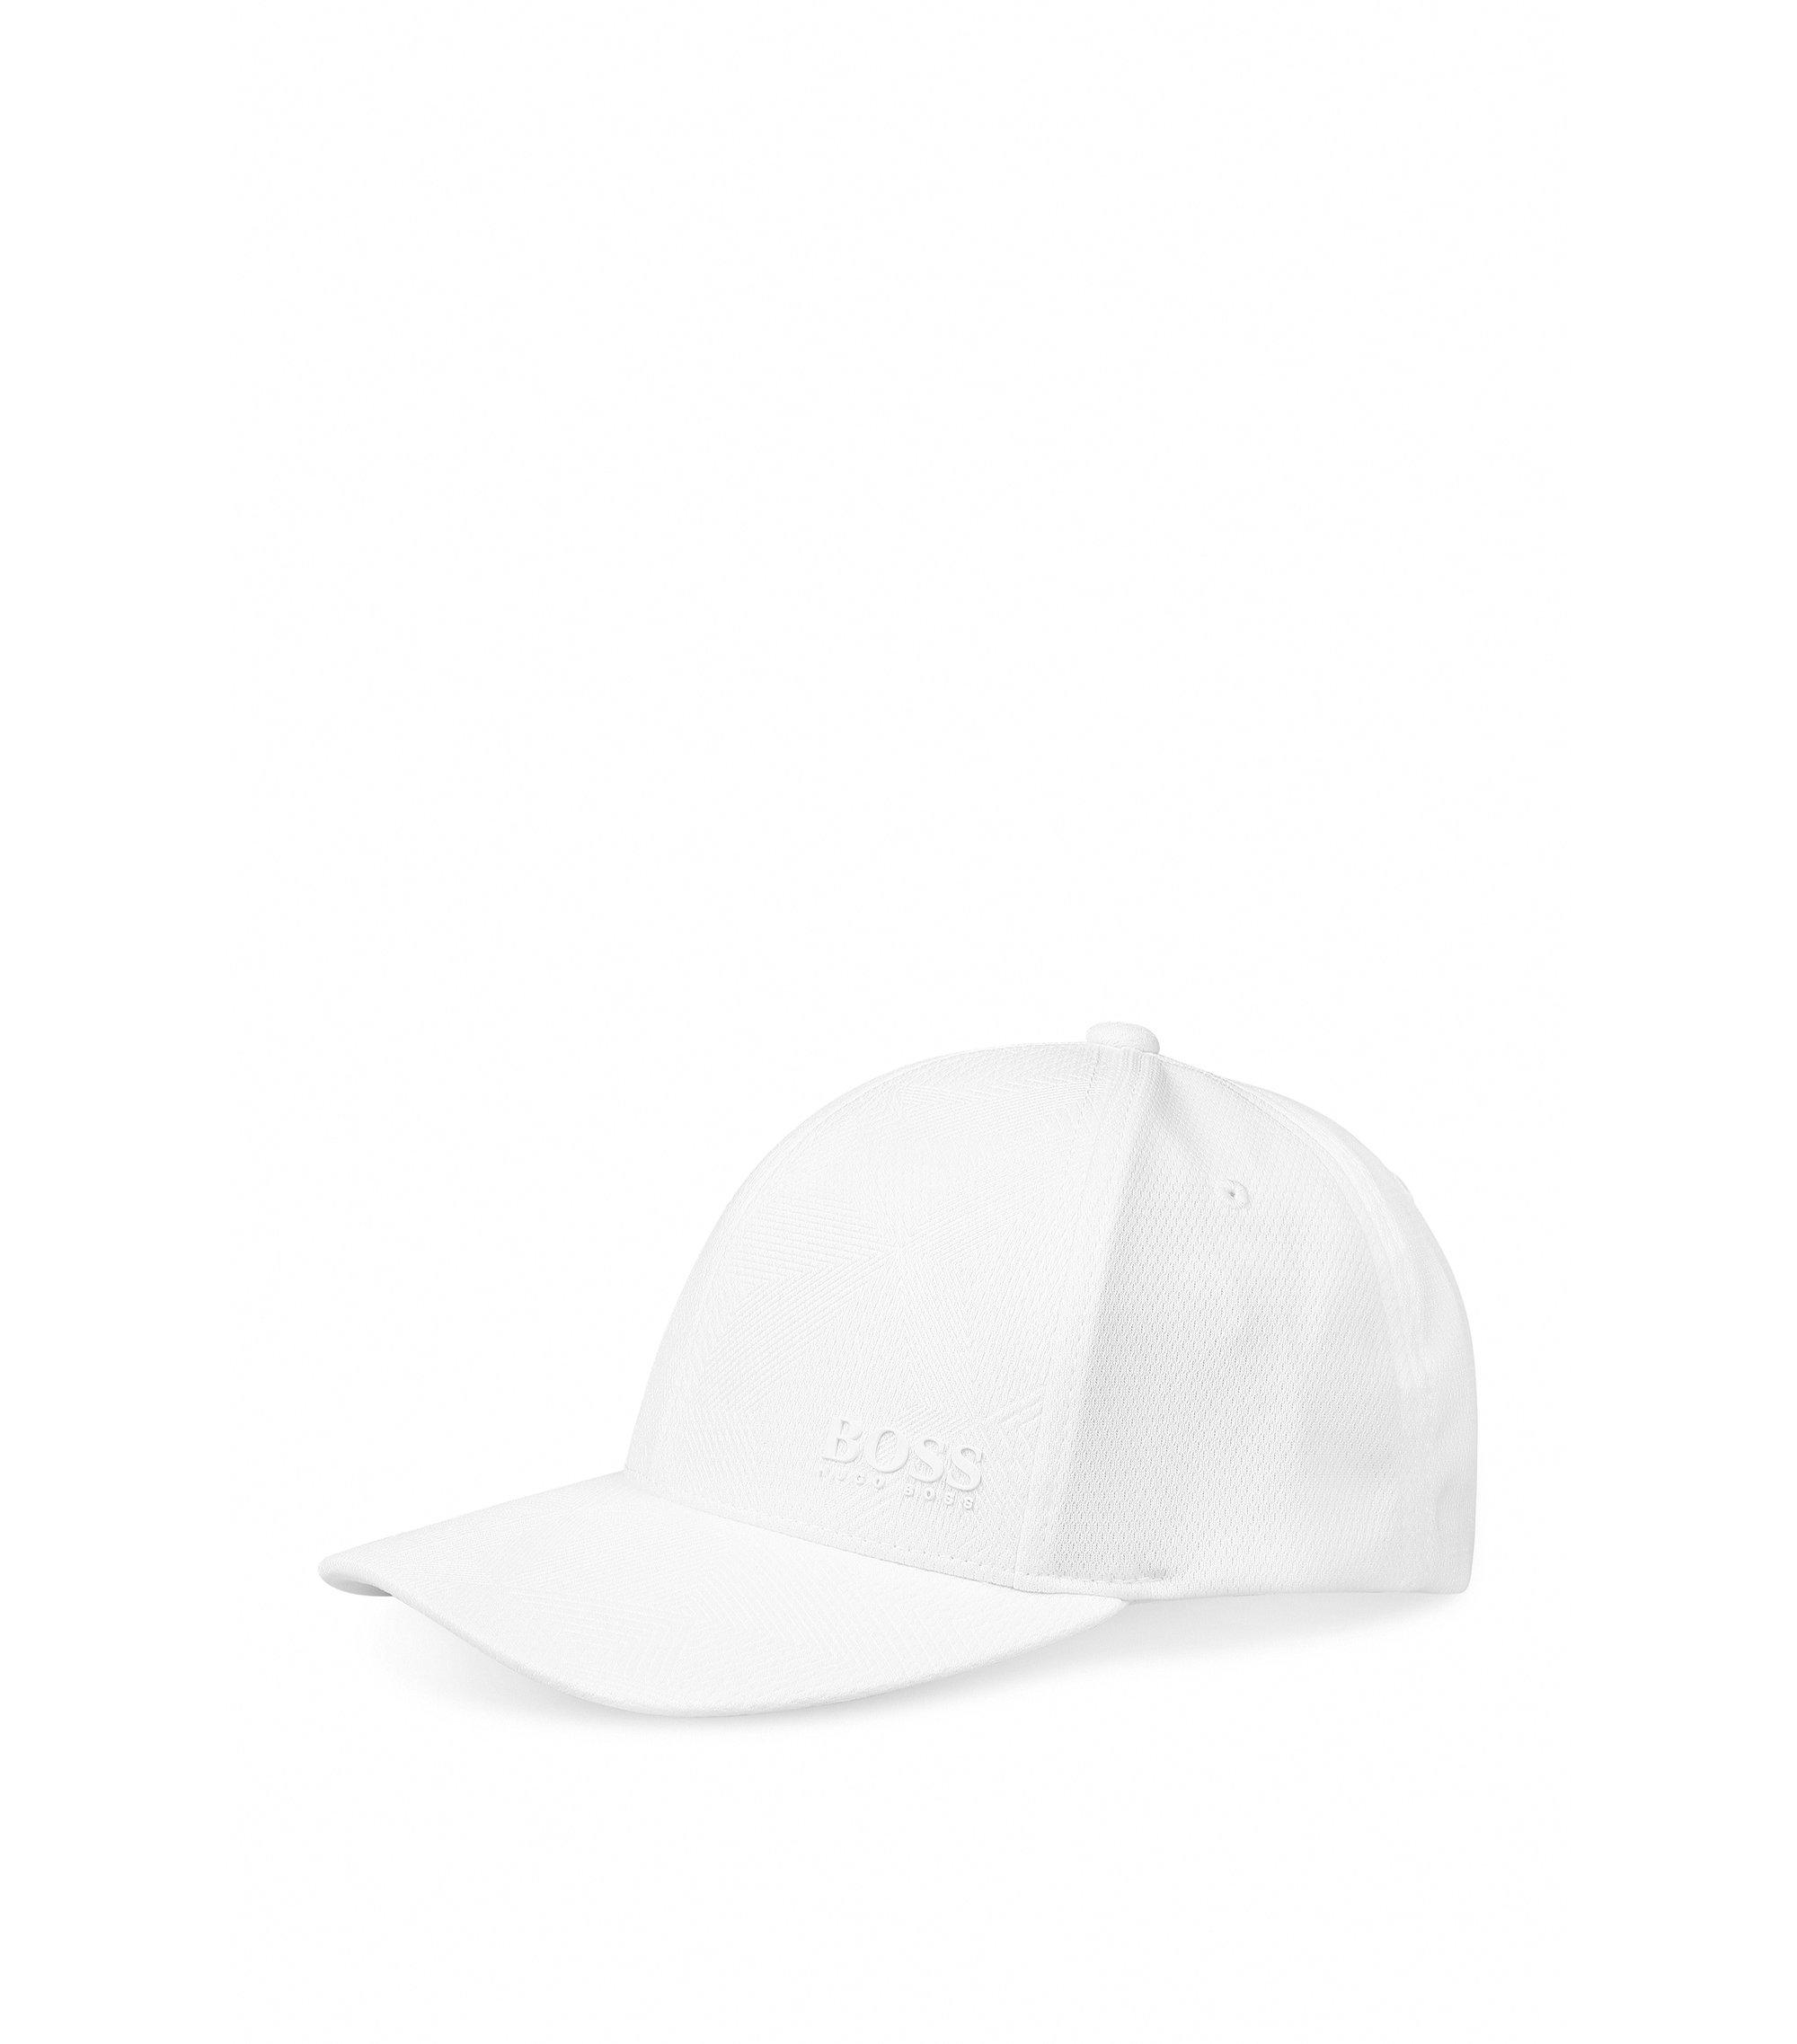 Geometric Print Baseball Cap | Printcap, White